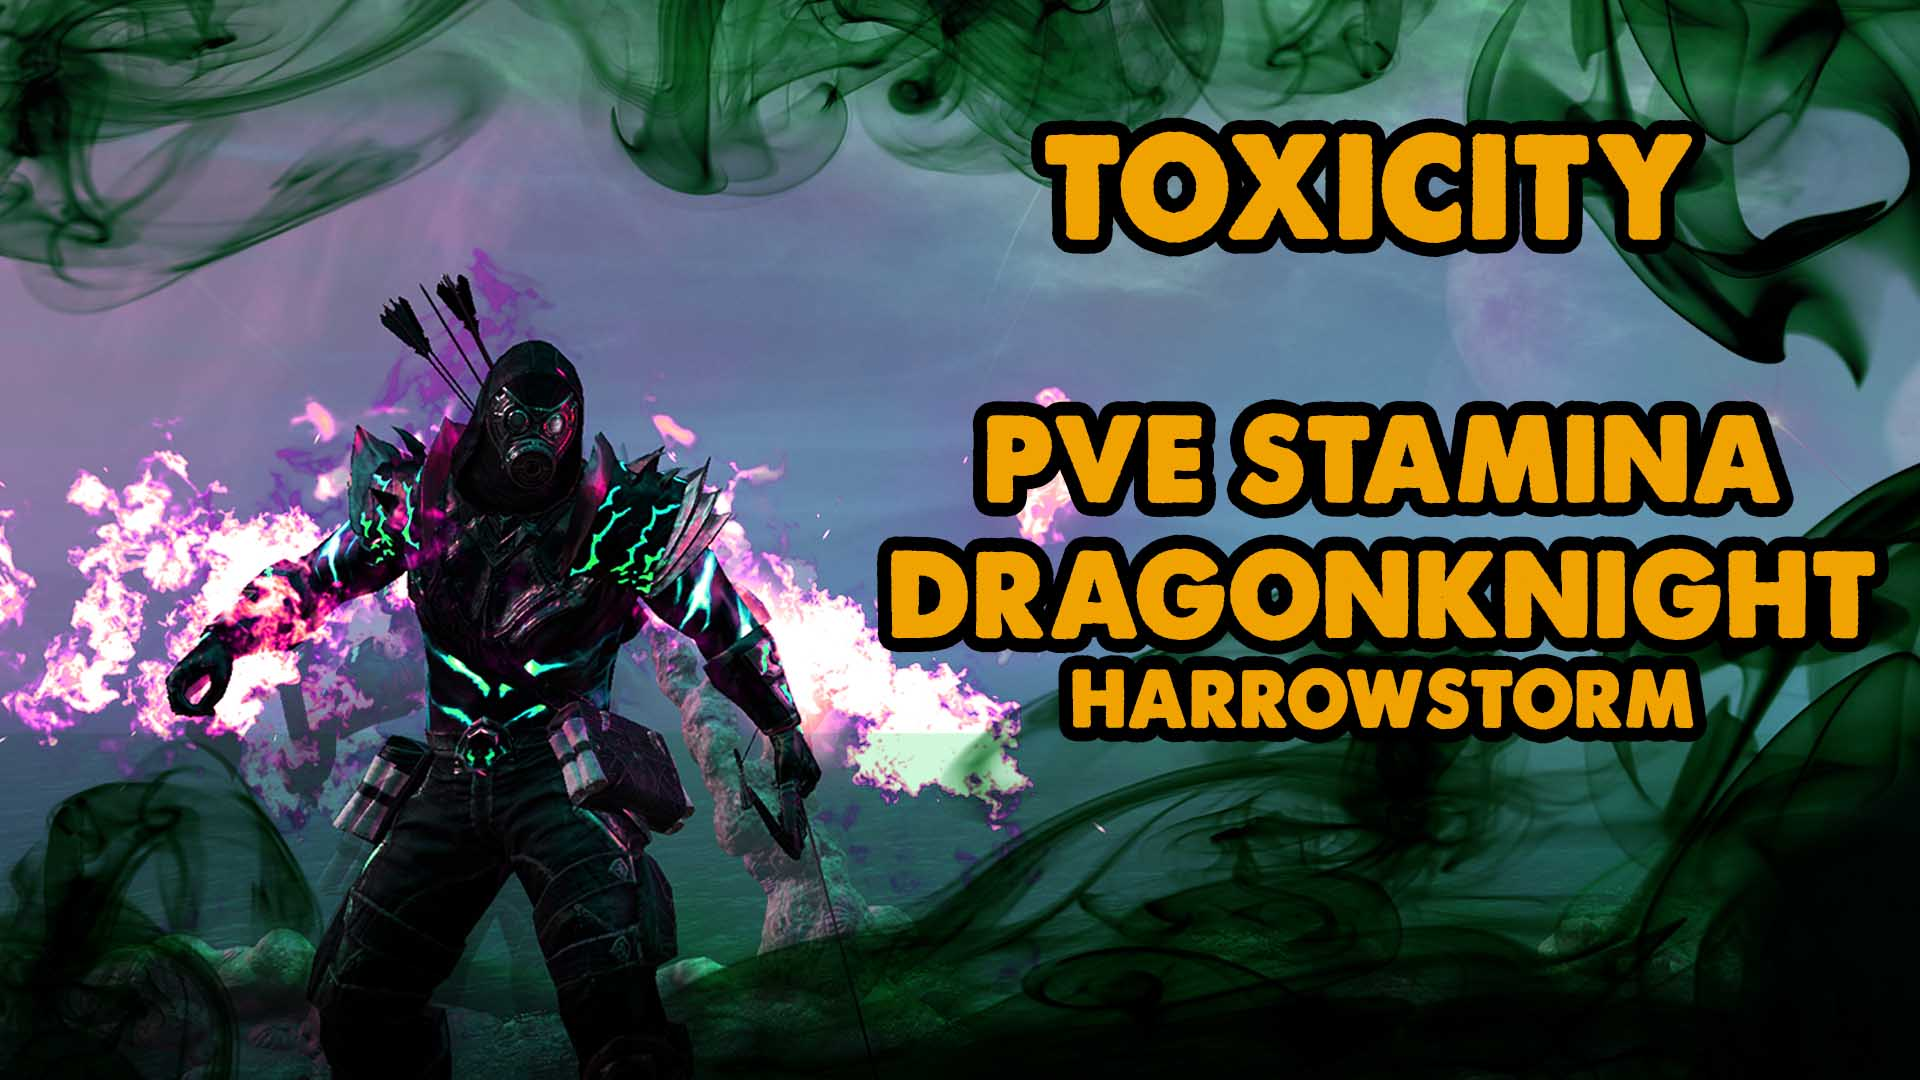 toxicity,stam dk, stamina dragonknight. pve build